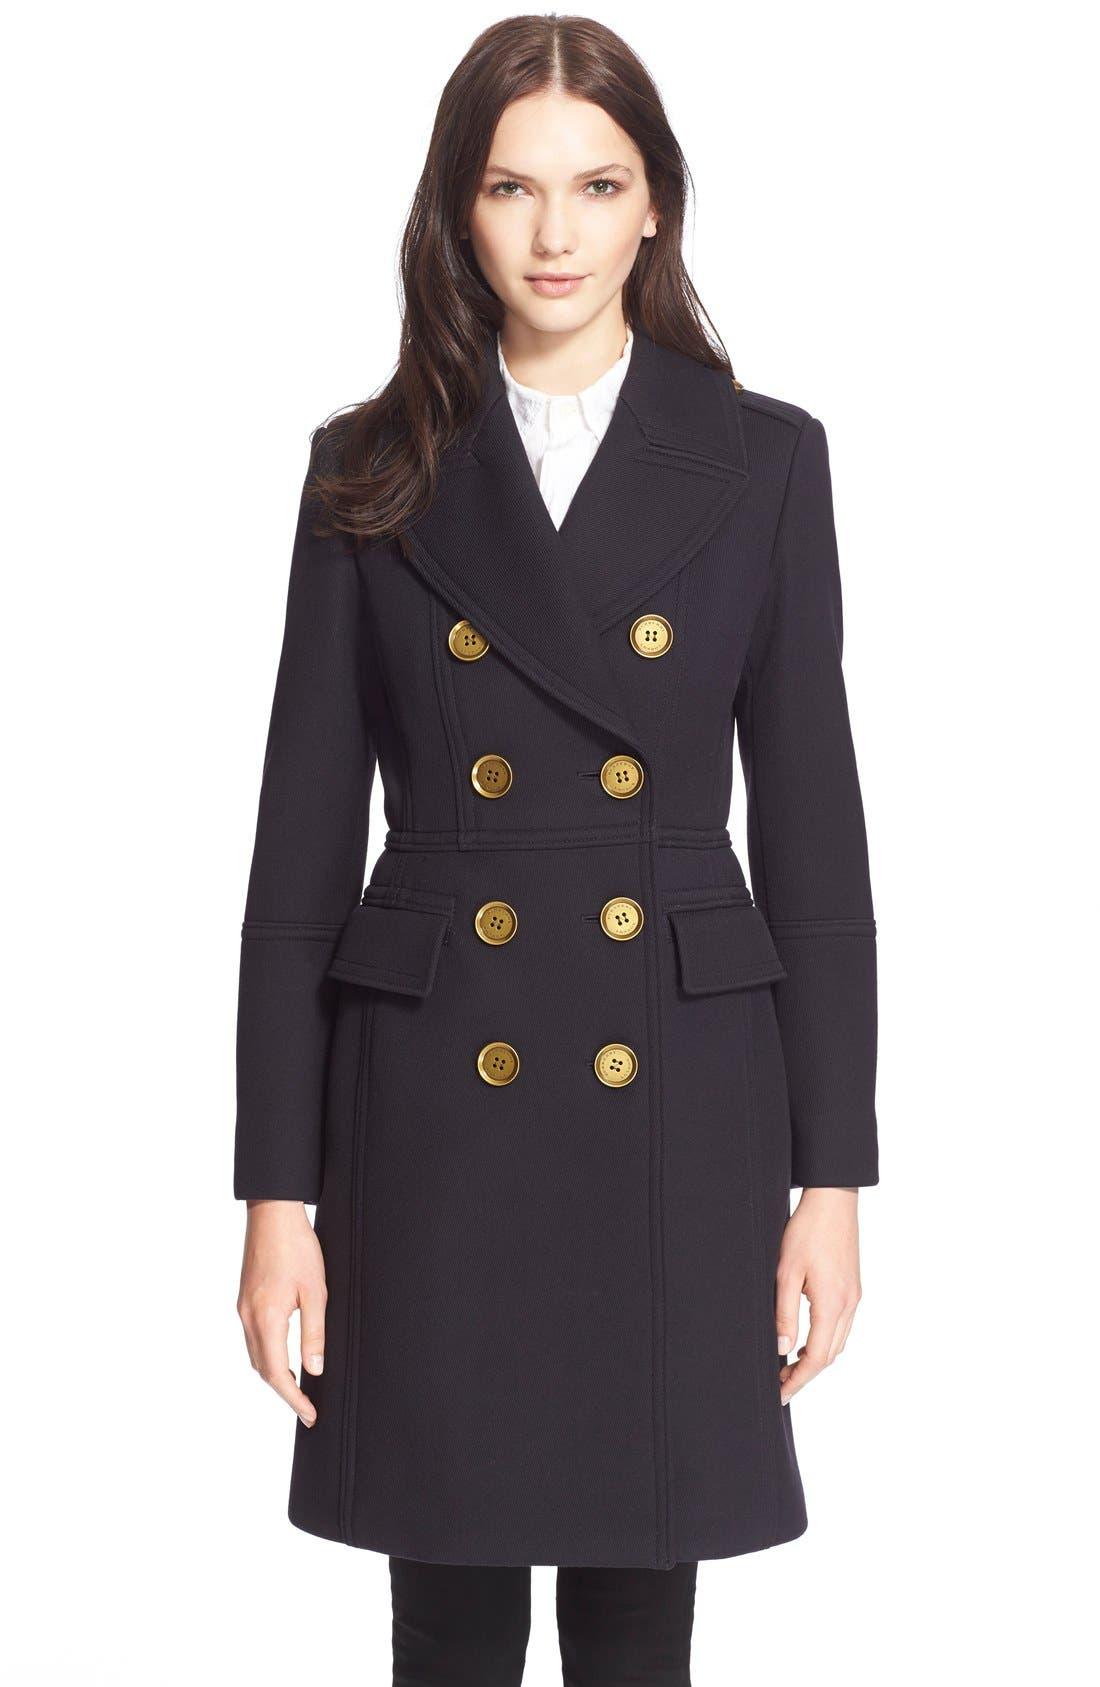 Alternate Image 1 Selected - BurberryLondon 'Whittingstall' Wool Military Coat